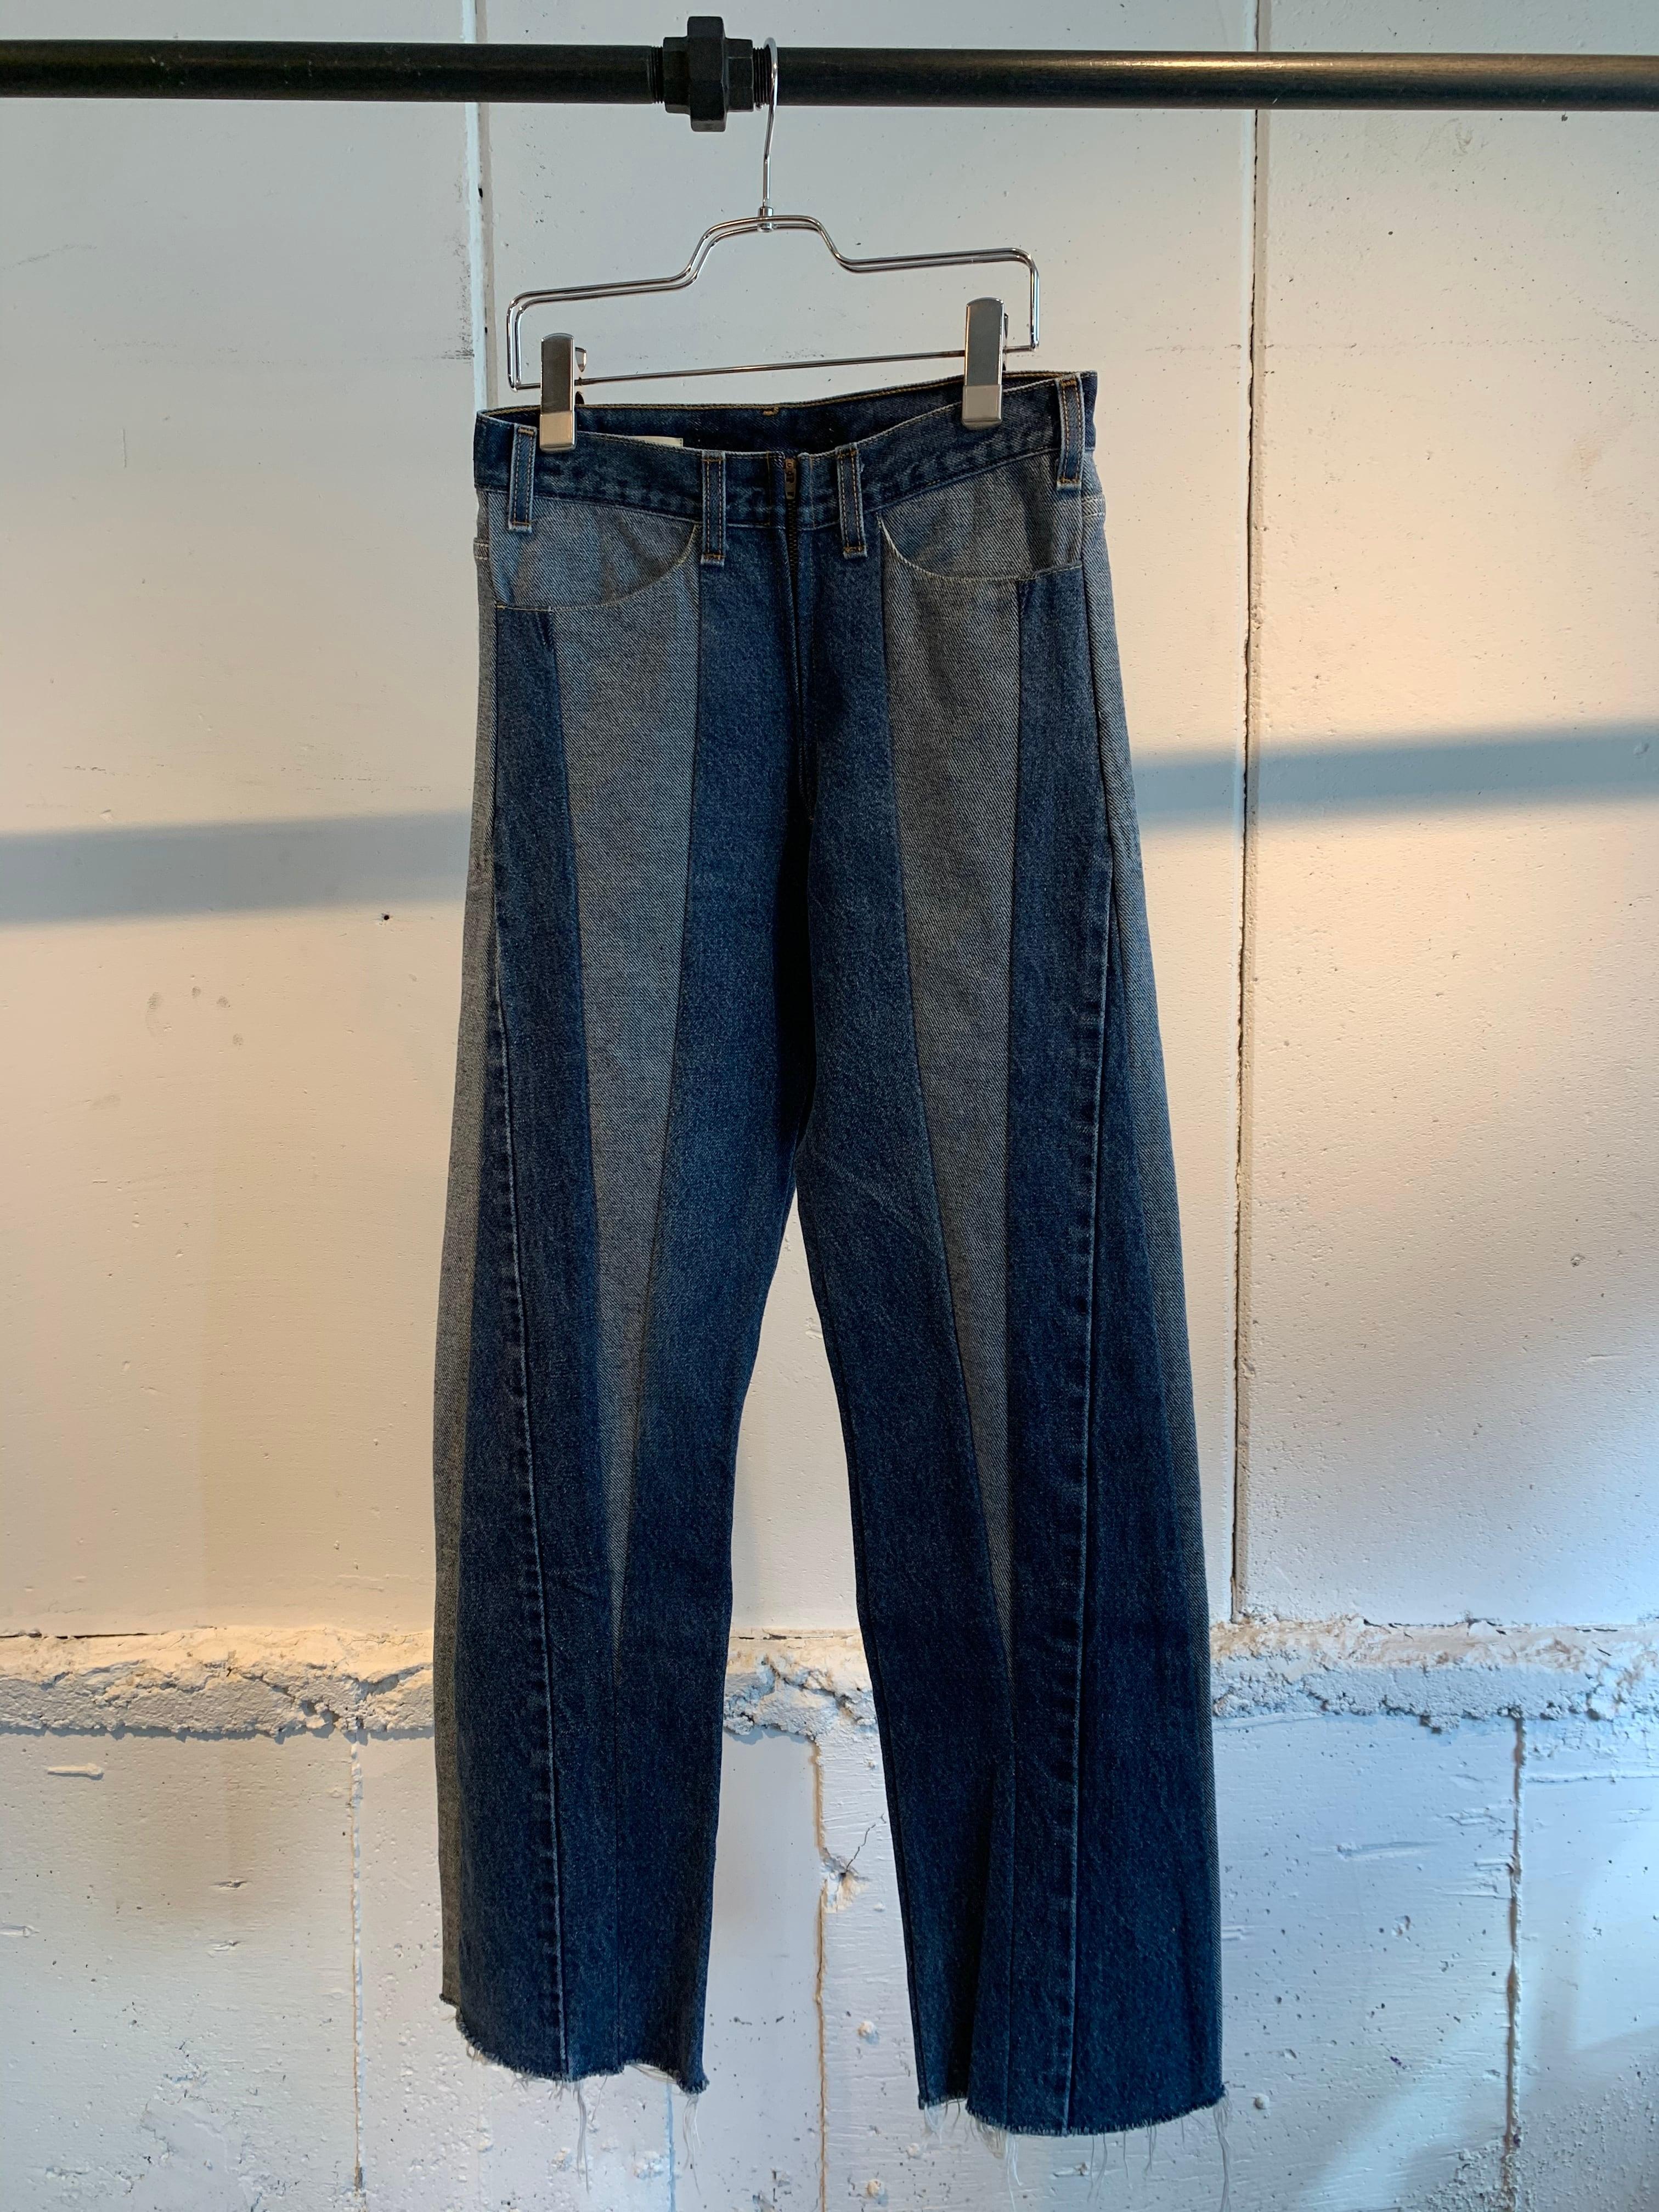 77circa circa make triangle cutback denim pants